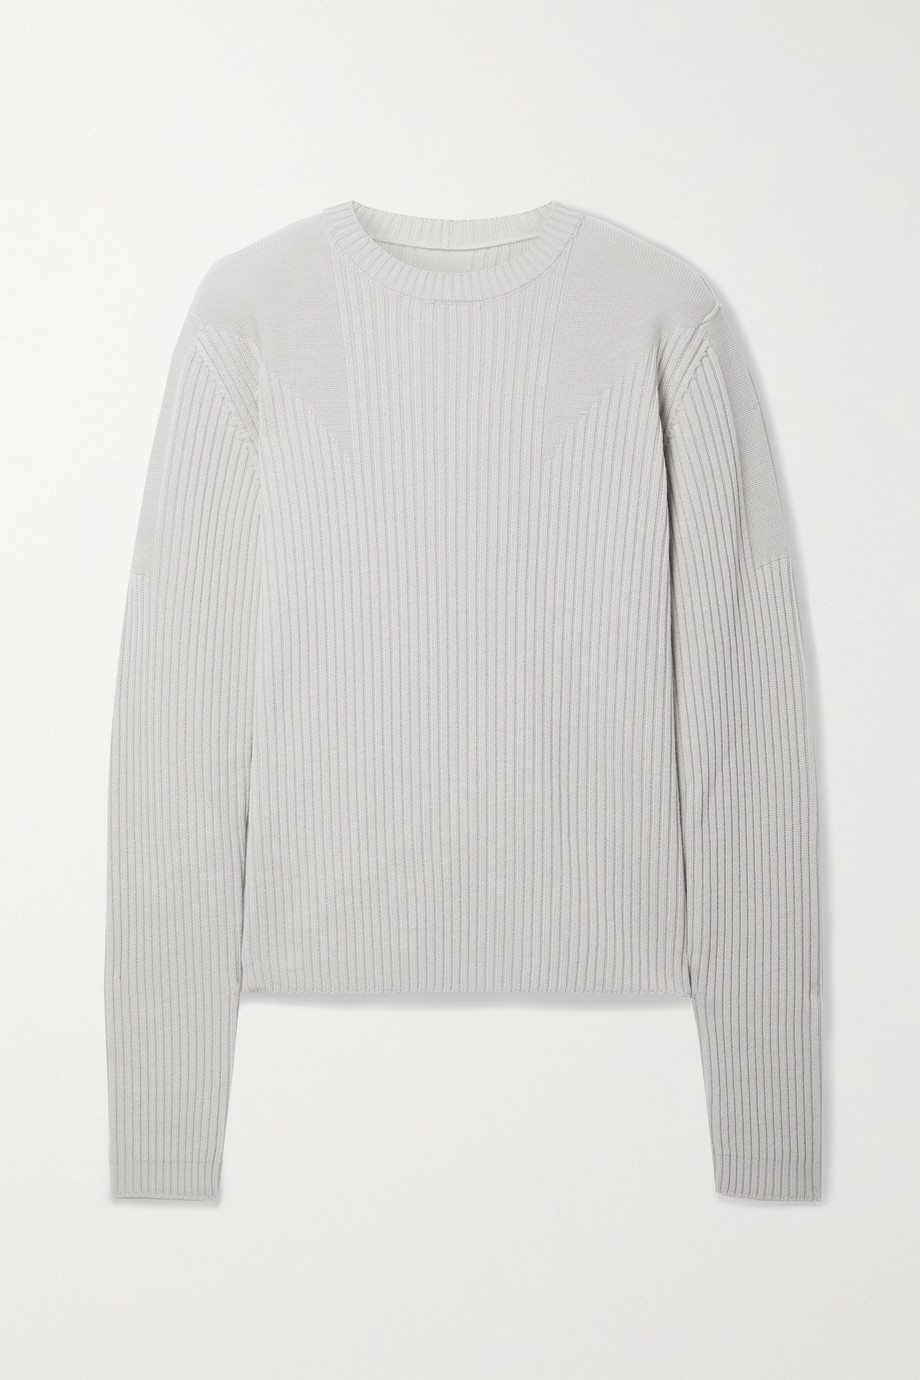 Rick Owens Gerippter Pullover aus Wolle